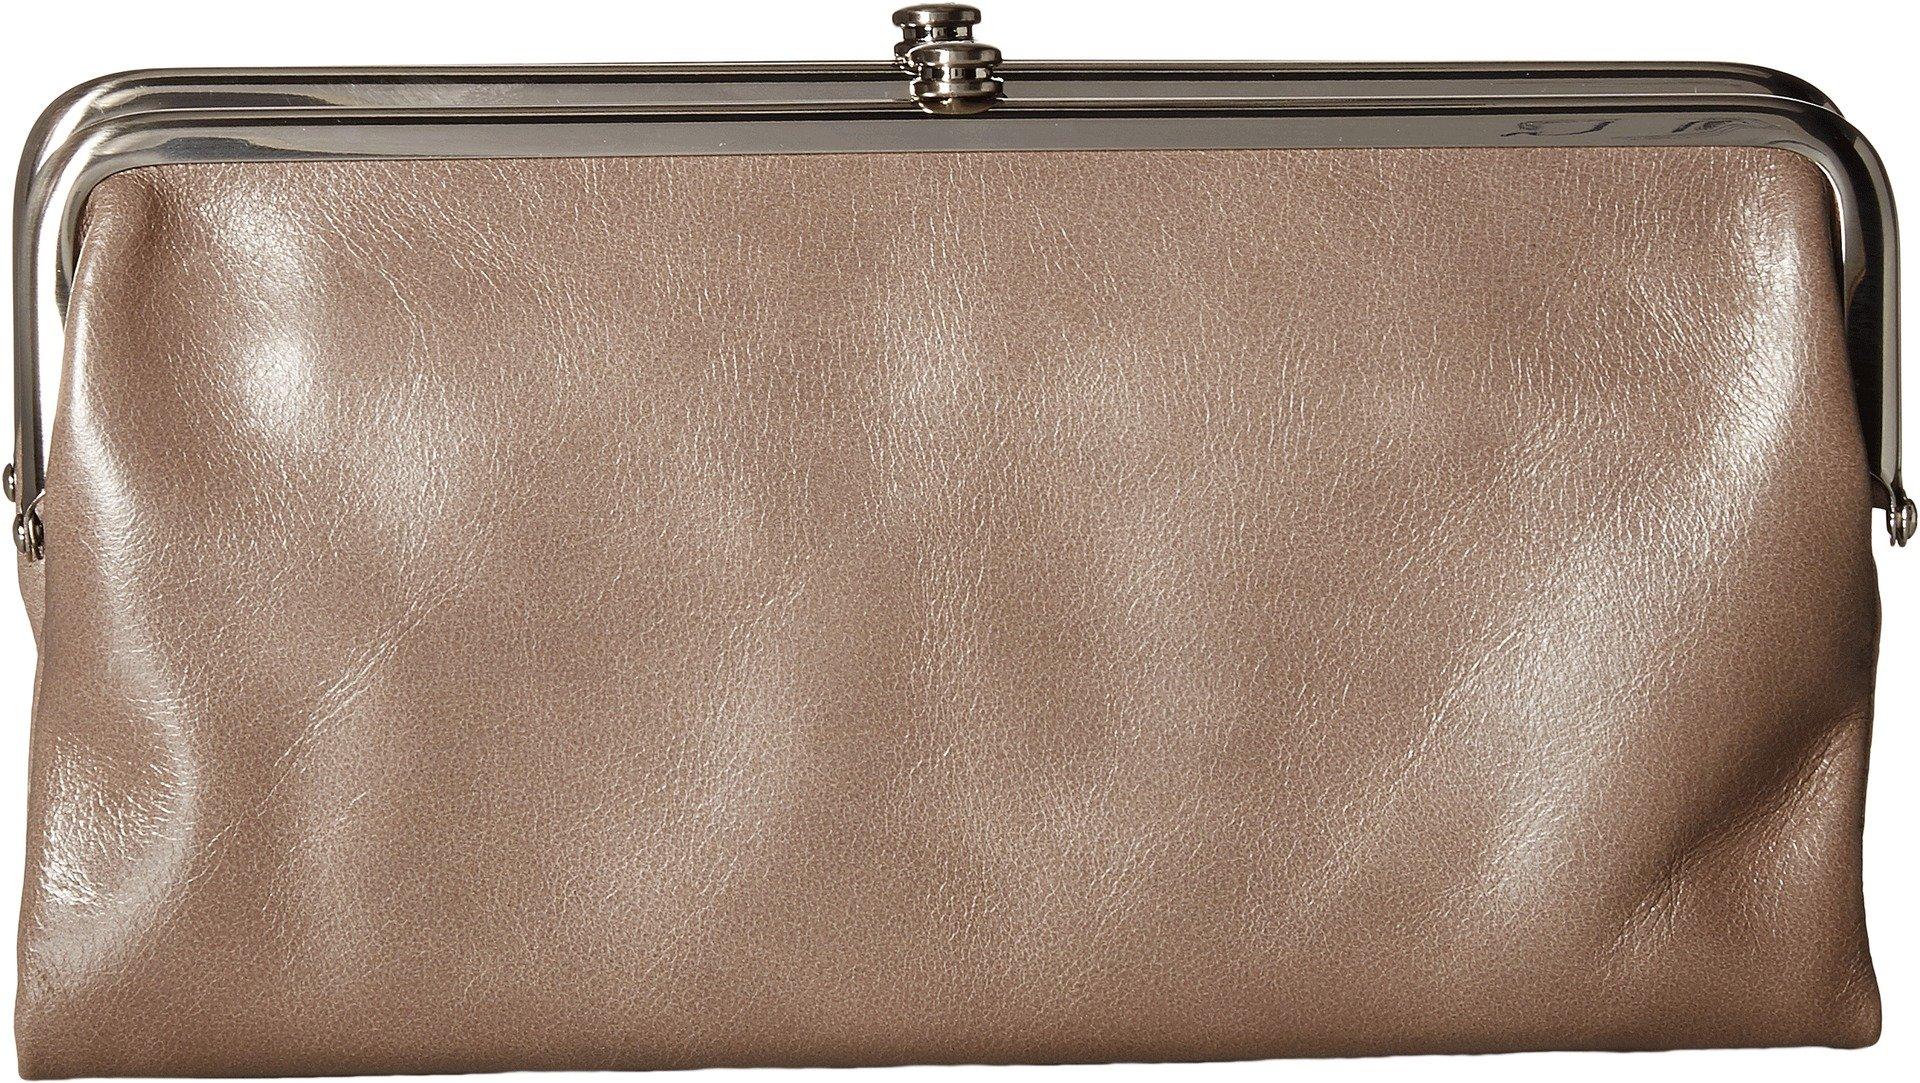 Hobo Womens Lauren Vintage Wallet Clutch Purse (Ash)